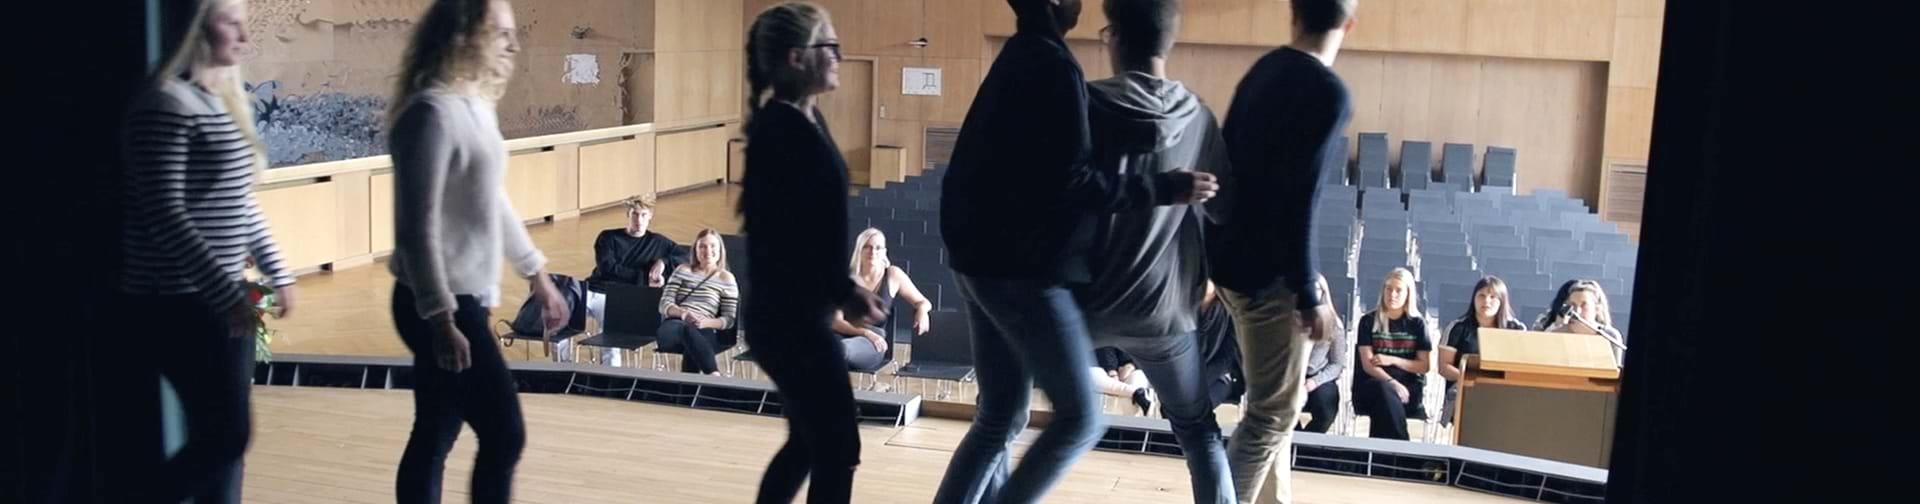 Drama undervisning på scene